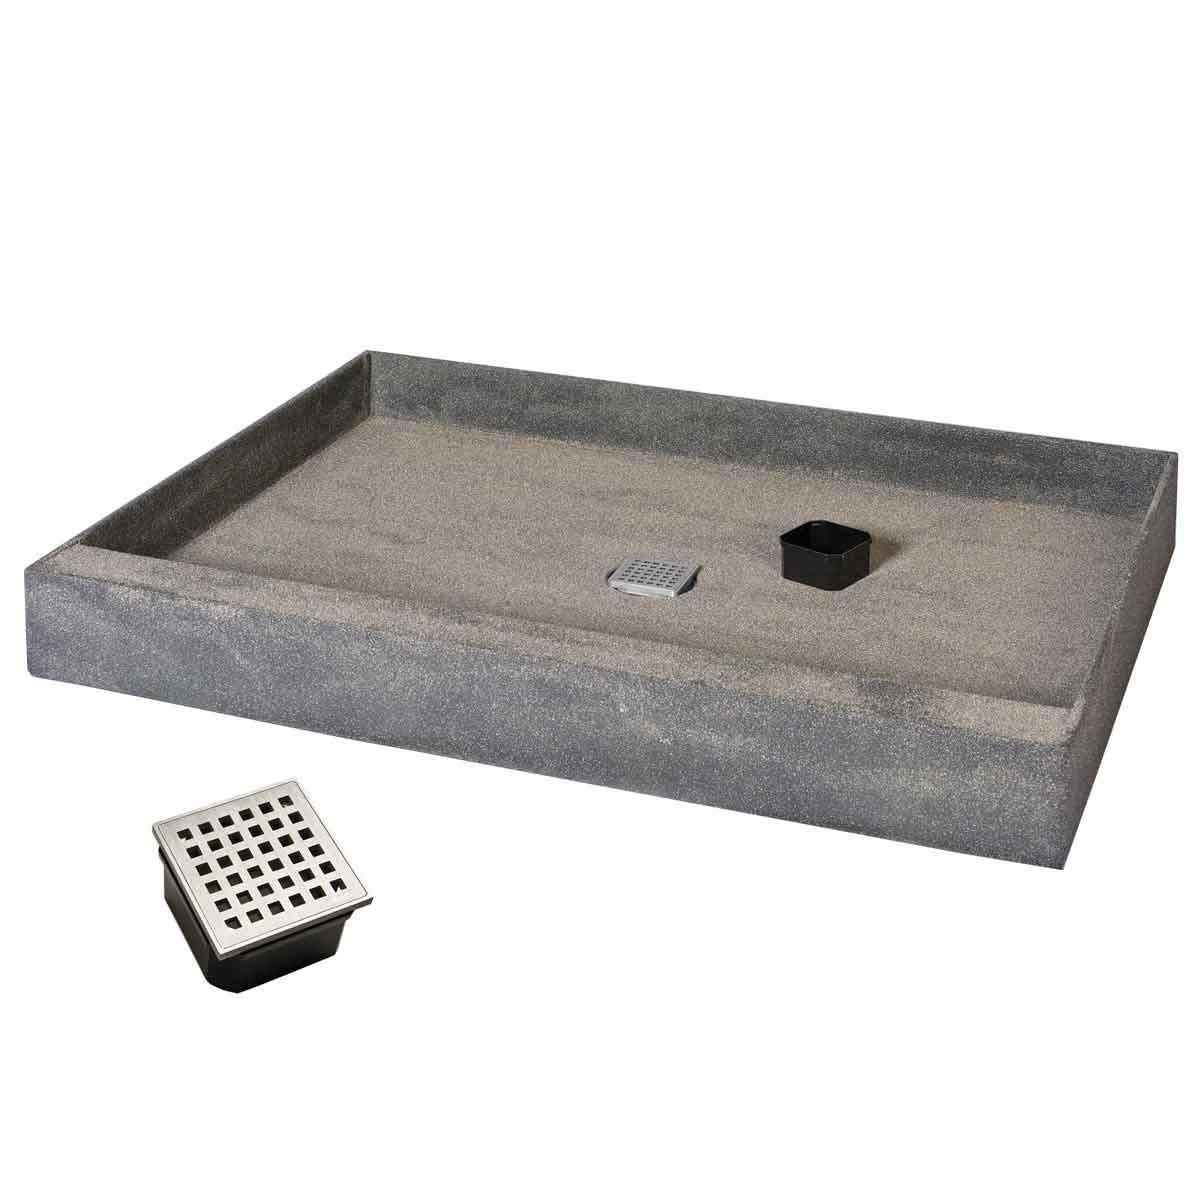 Wedi Ecobath OneStep Shower Base